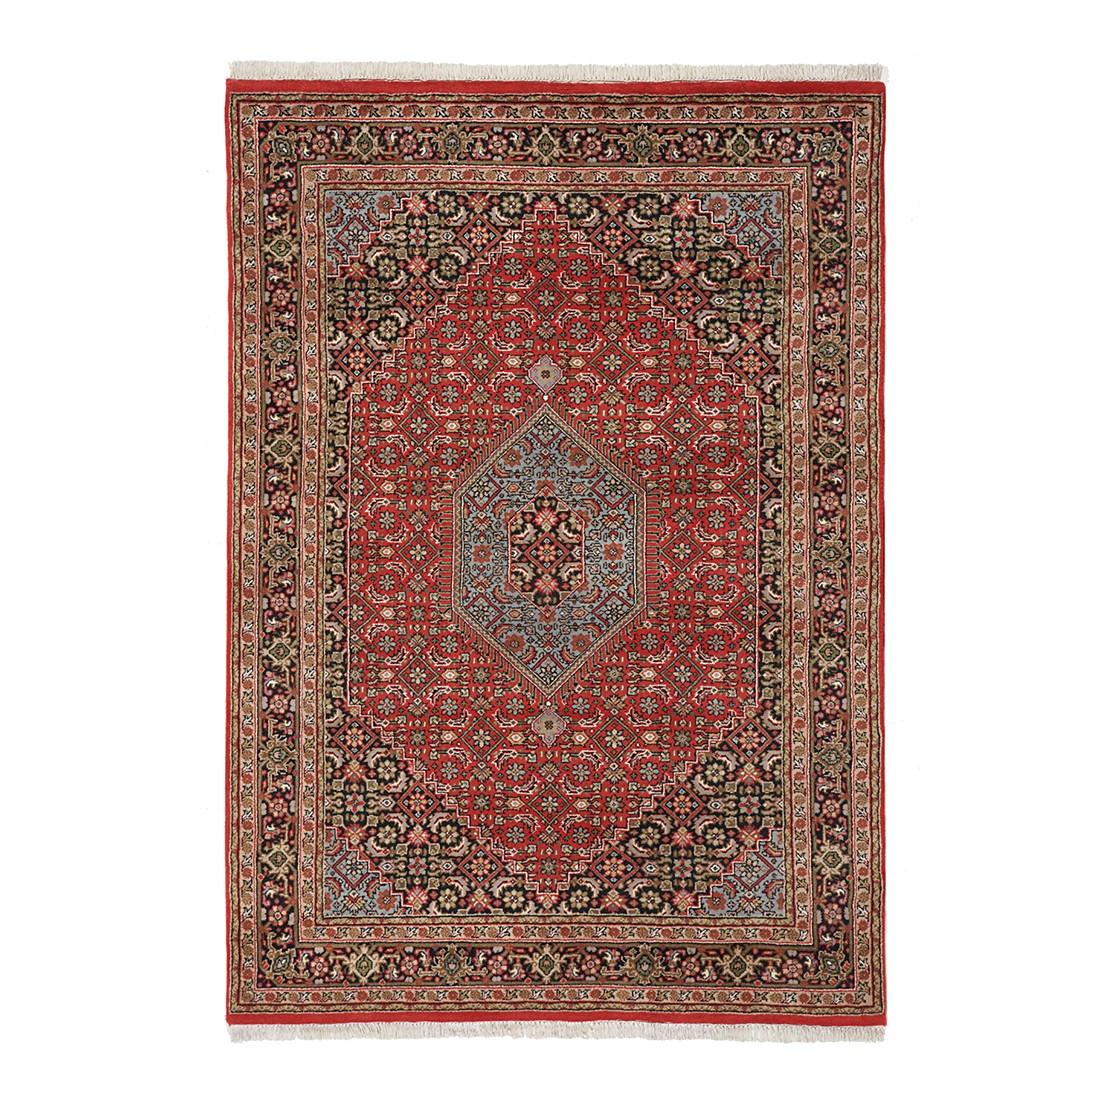 Teppich Mohammadi Bidjar – Rot – 60 x 90 cm, Parwis jetzt kaufen